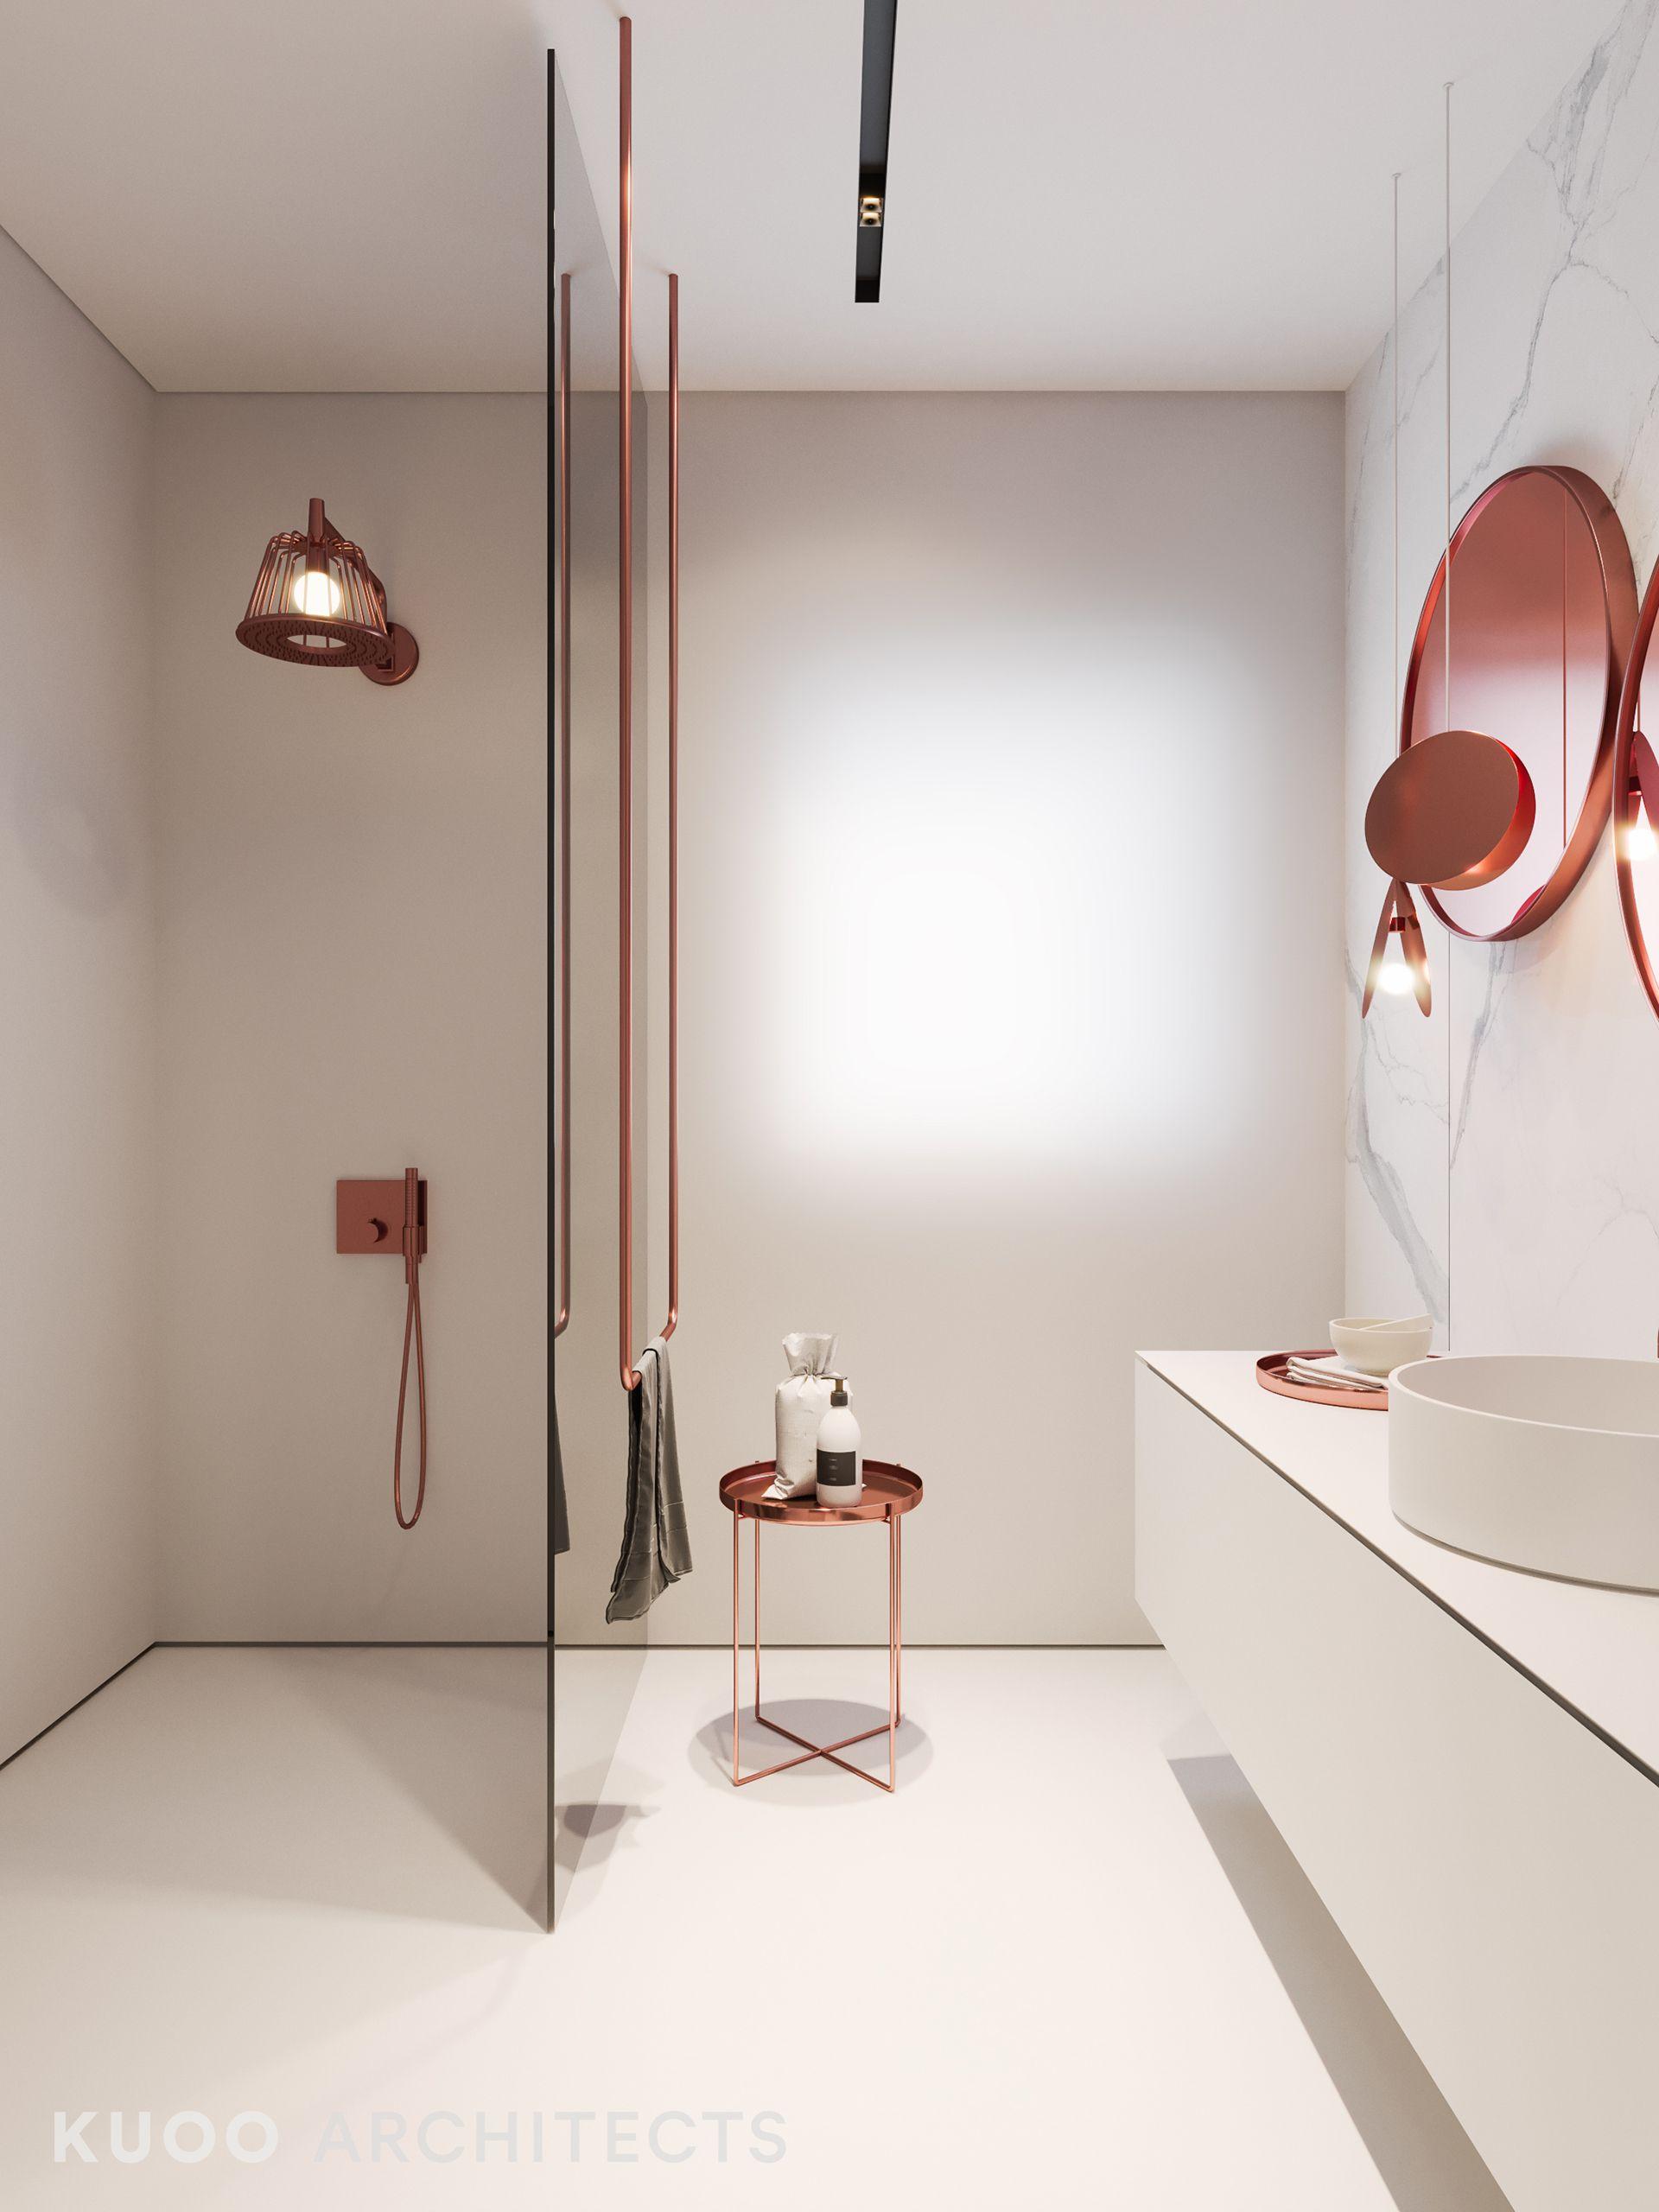 f6e65a58712283.5a062529a8e17.jpg (1920×2560) | Bathroom | Pinterest ...